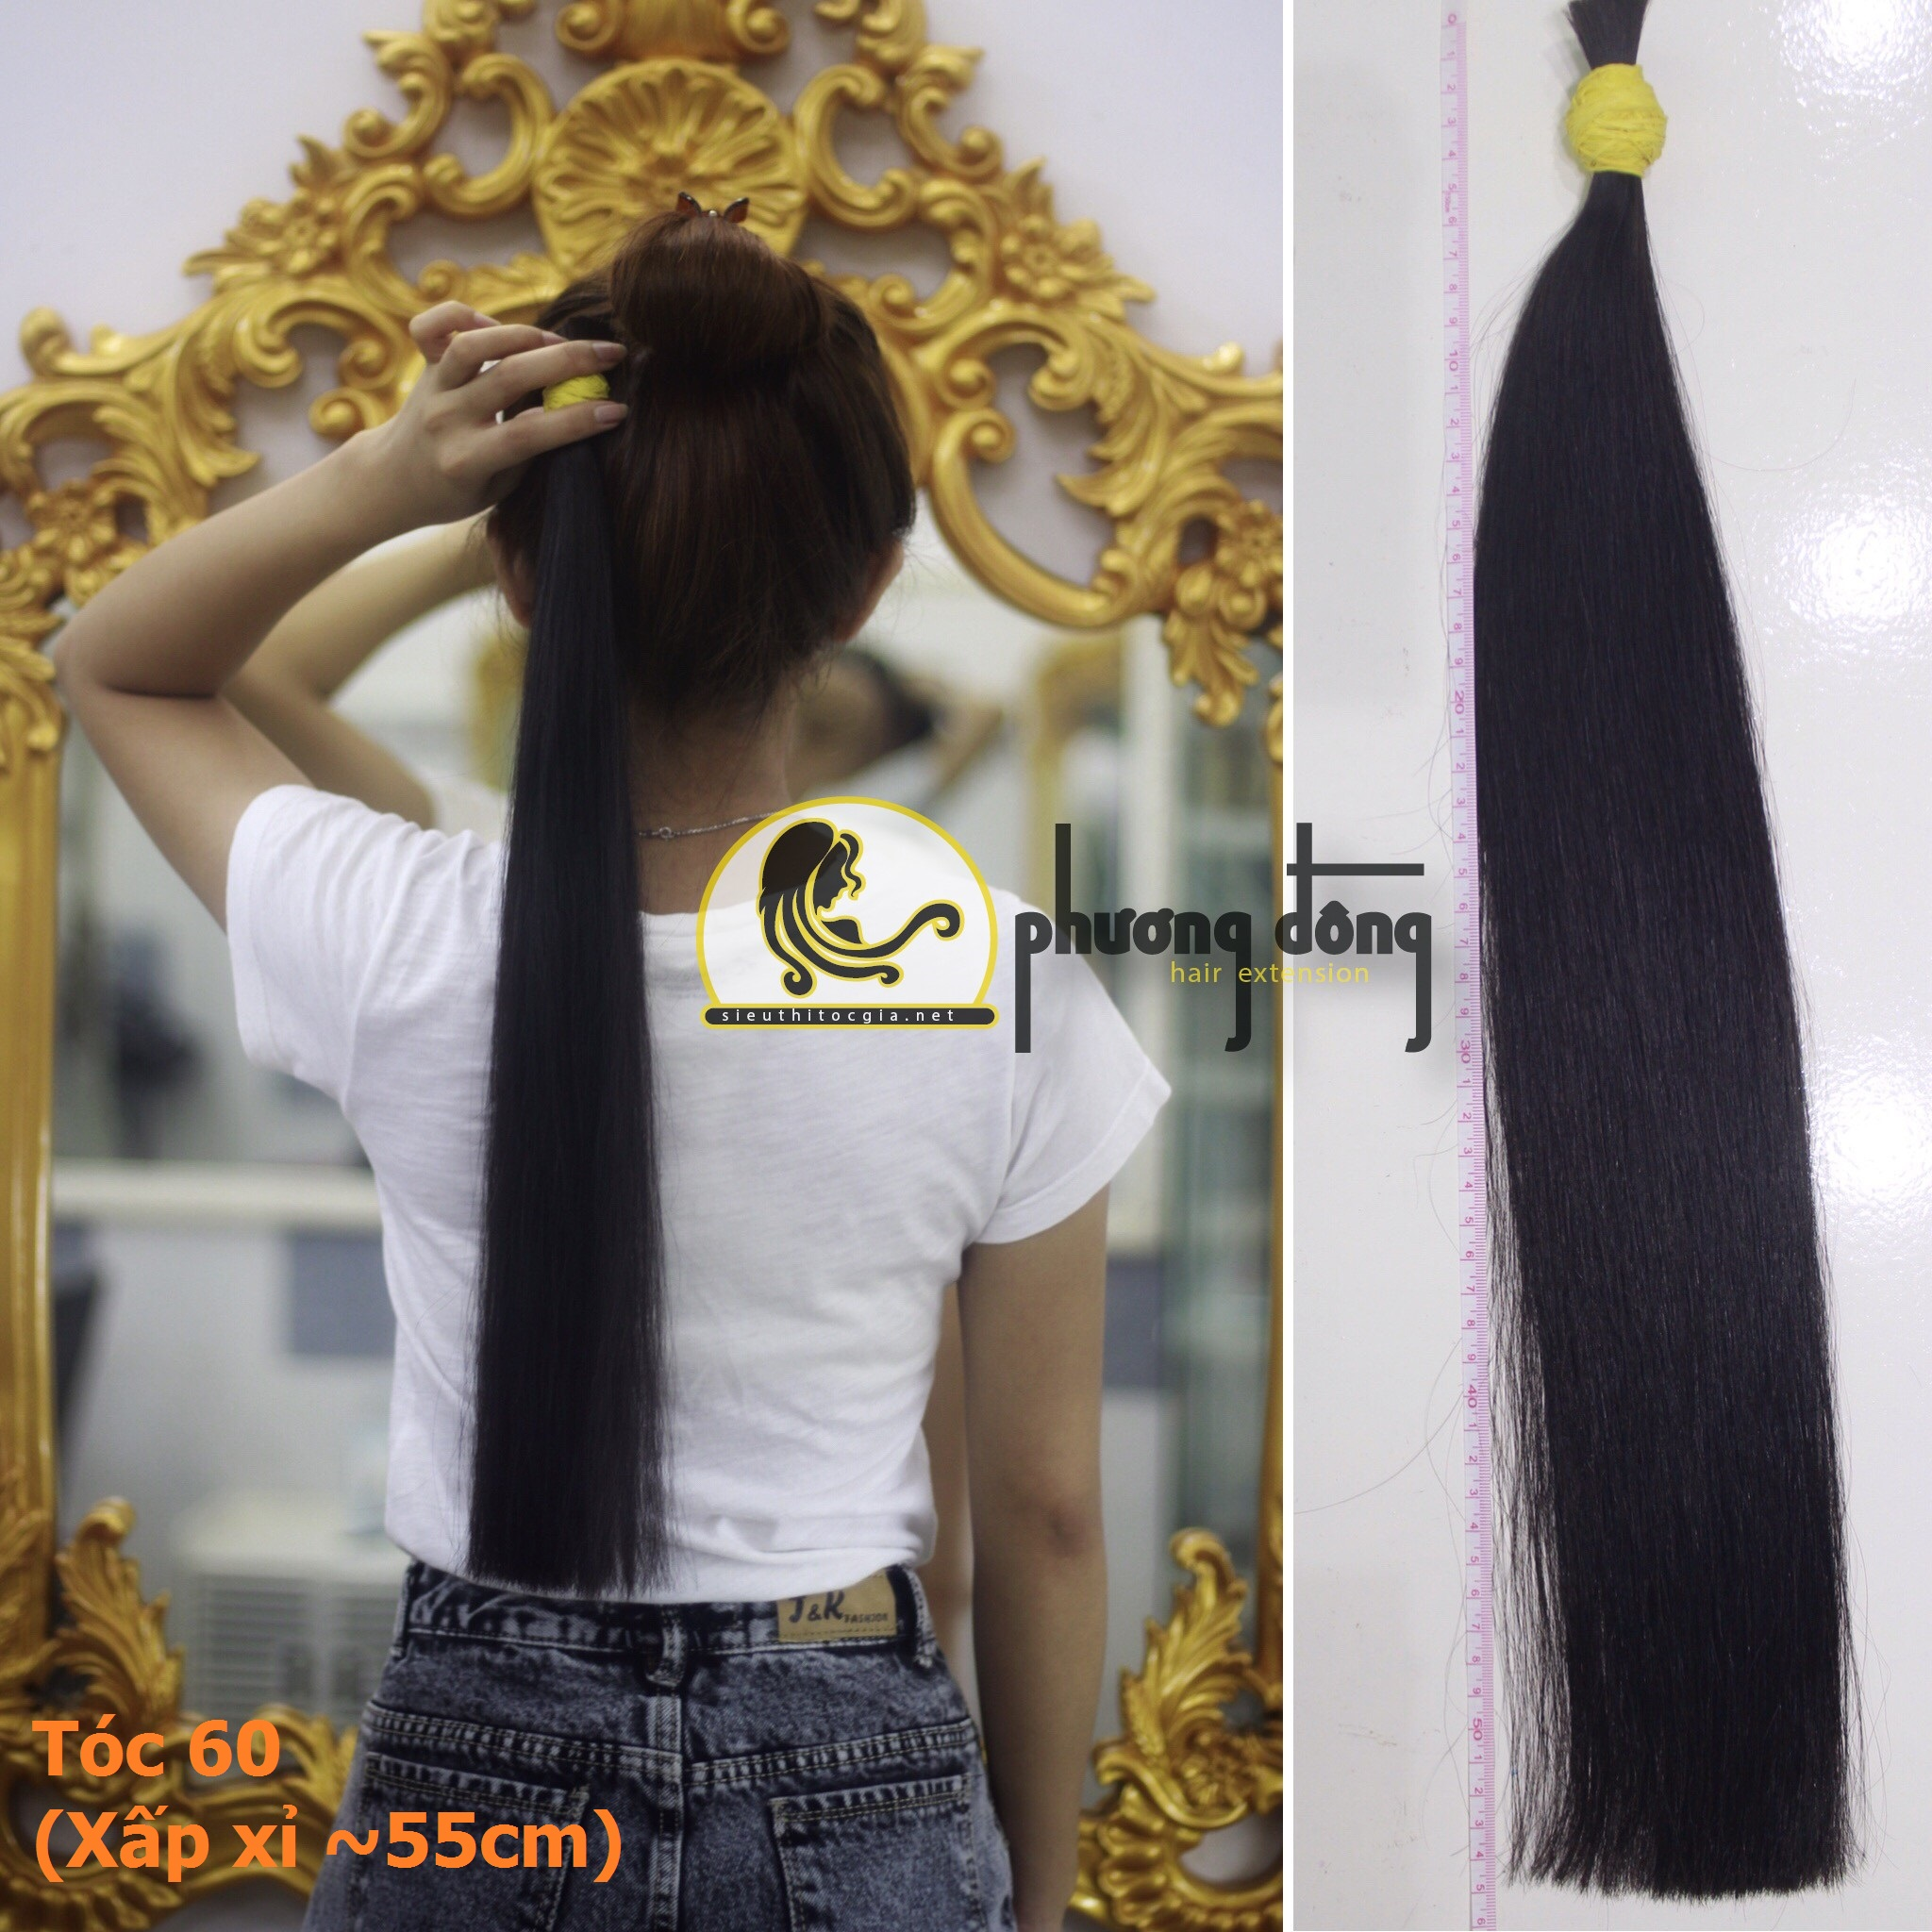 Phân phối tóc nối